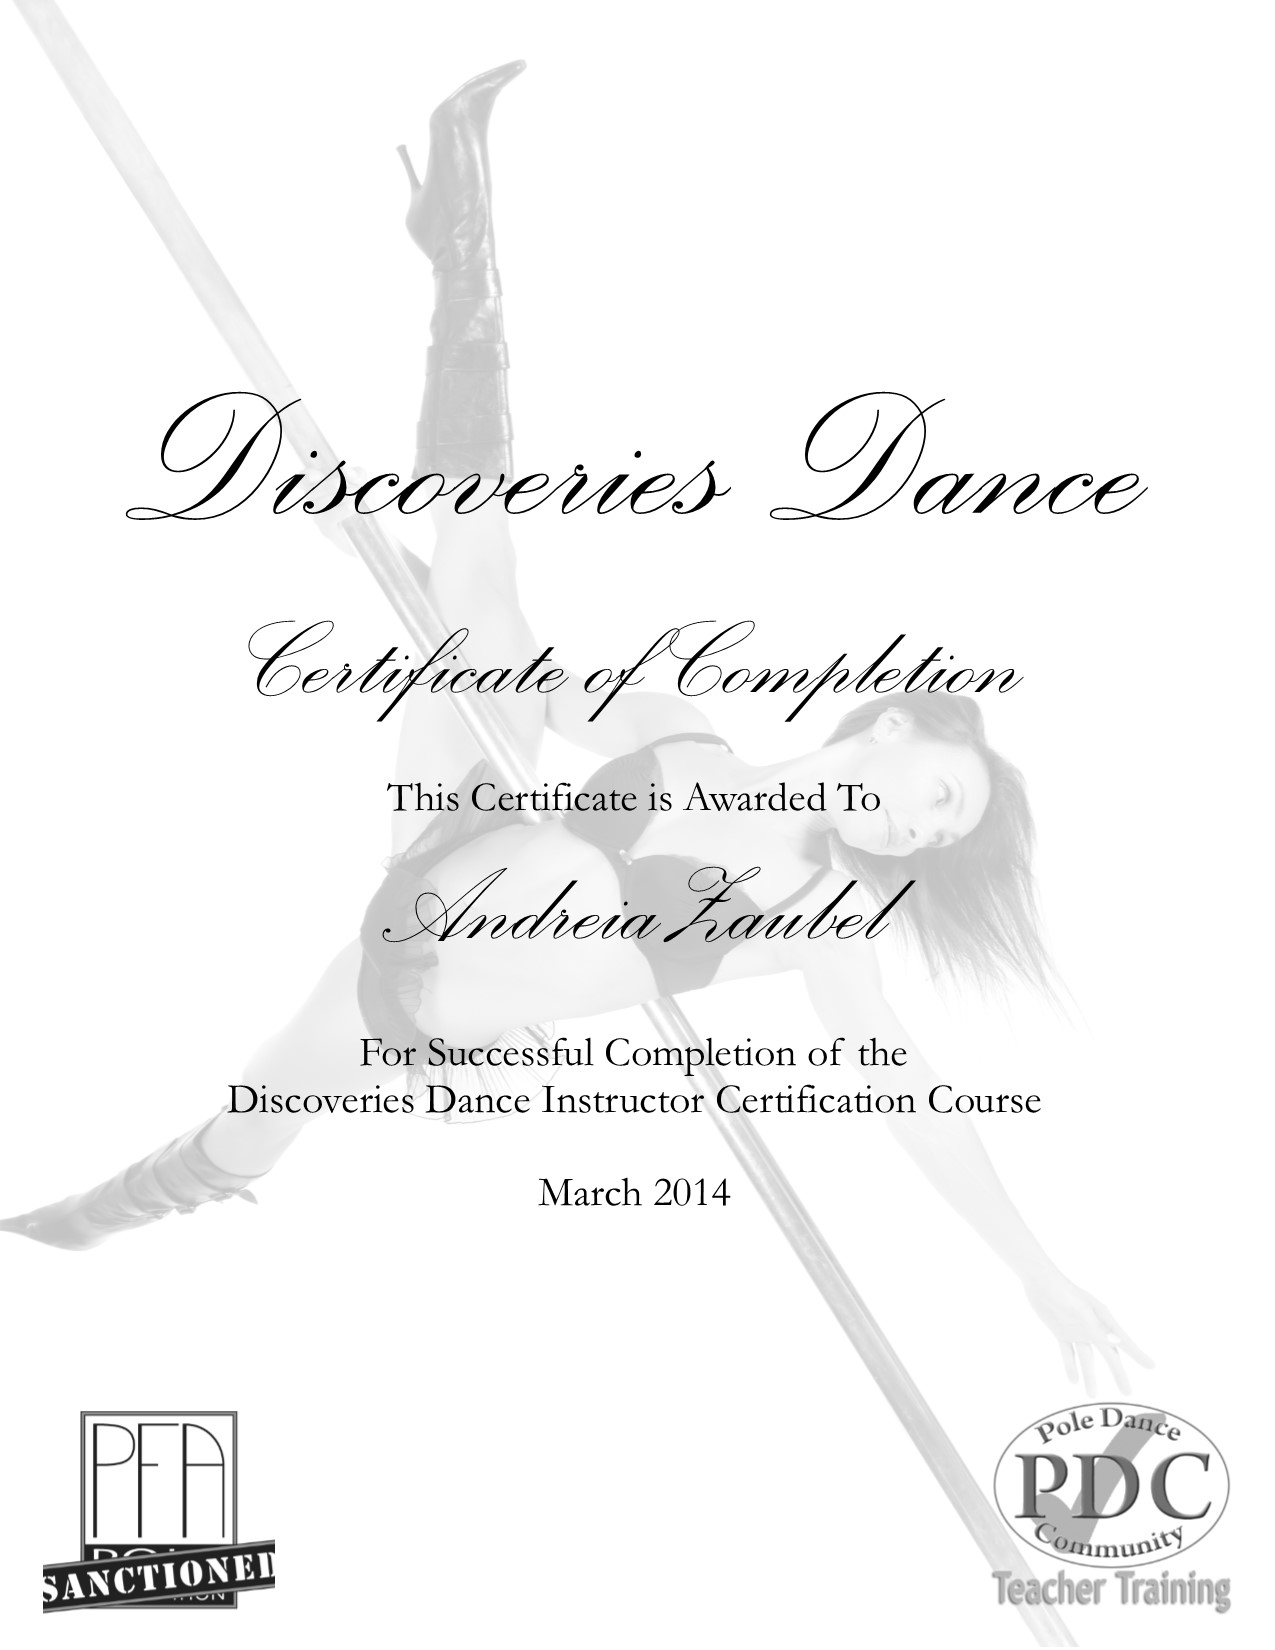 Discoveries pole dance instructor certification andreia zaubel xflitez Choice Image